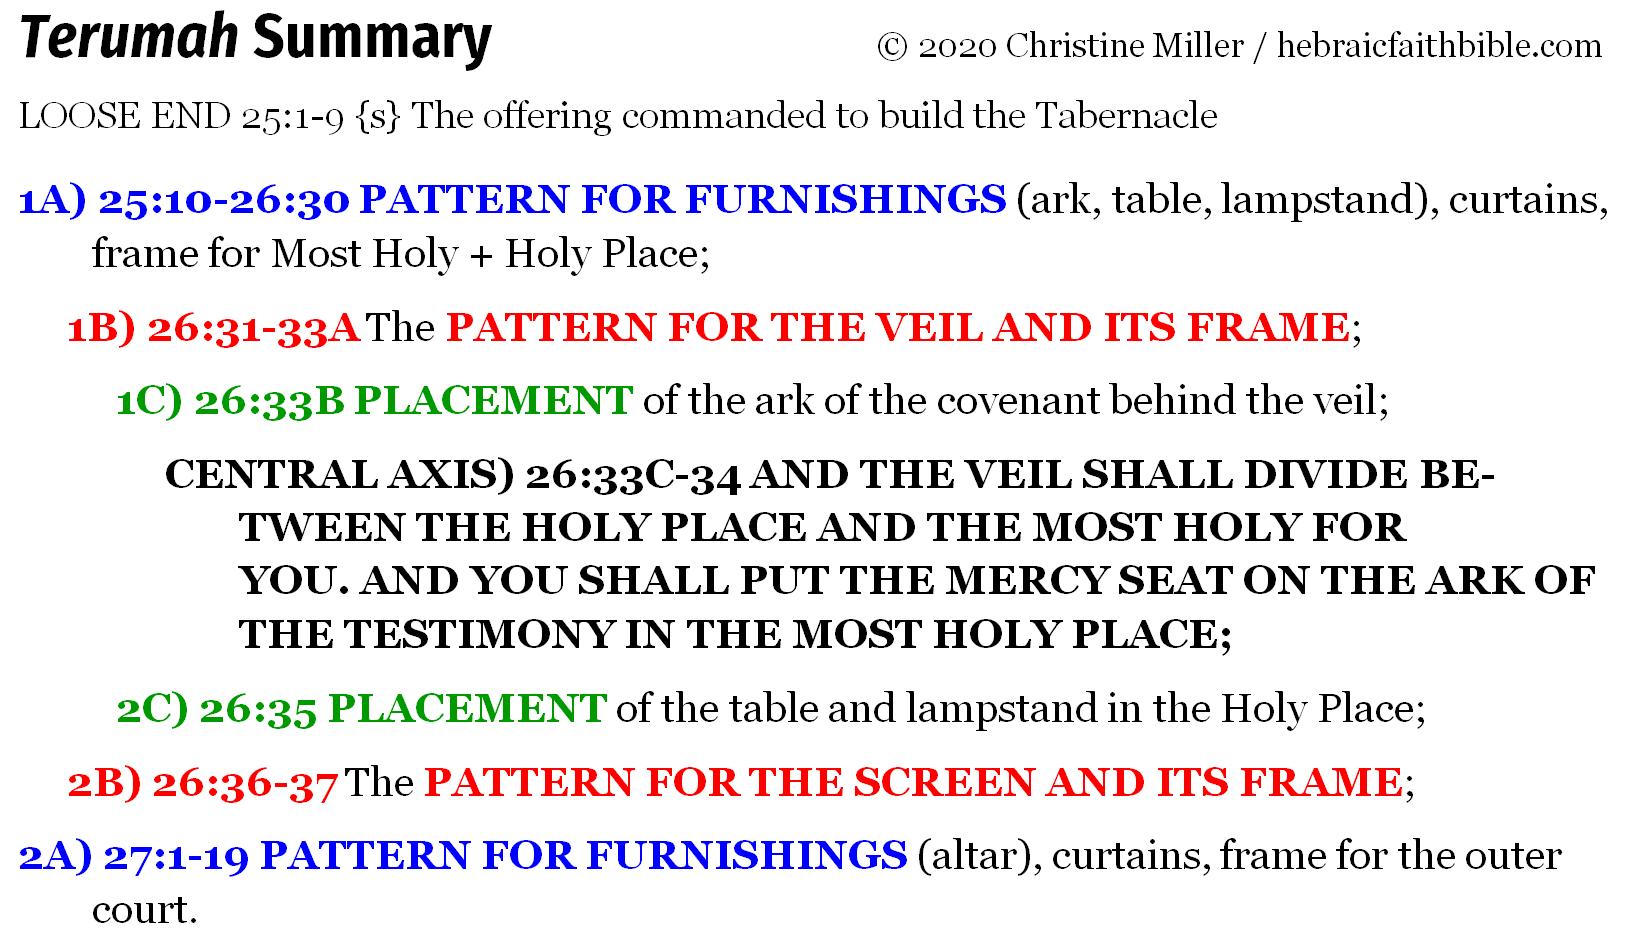 Exo 25:1-27:19 Terumah chiasm summary | hebraicfaithbible.com